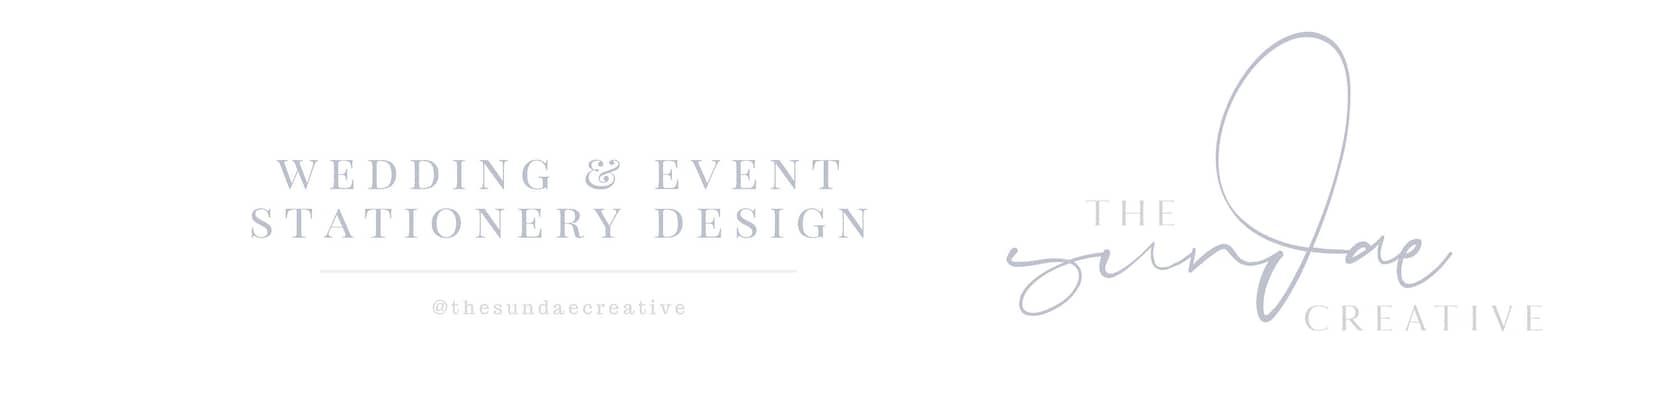 Wedding Event Stationery Design By Thesundaecreative On Etsy